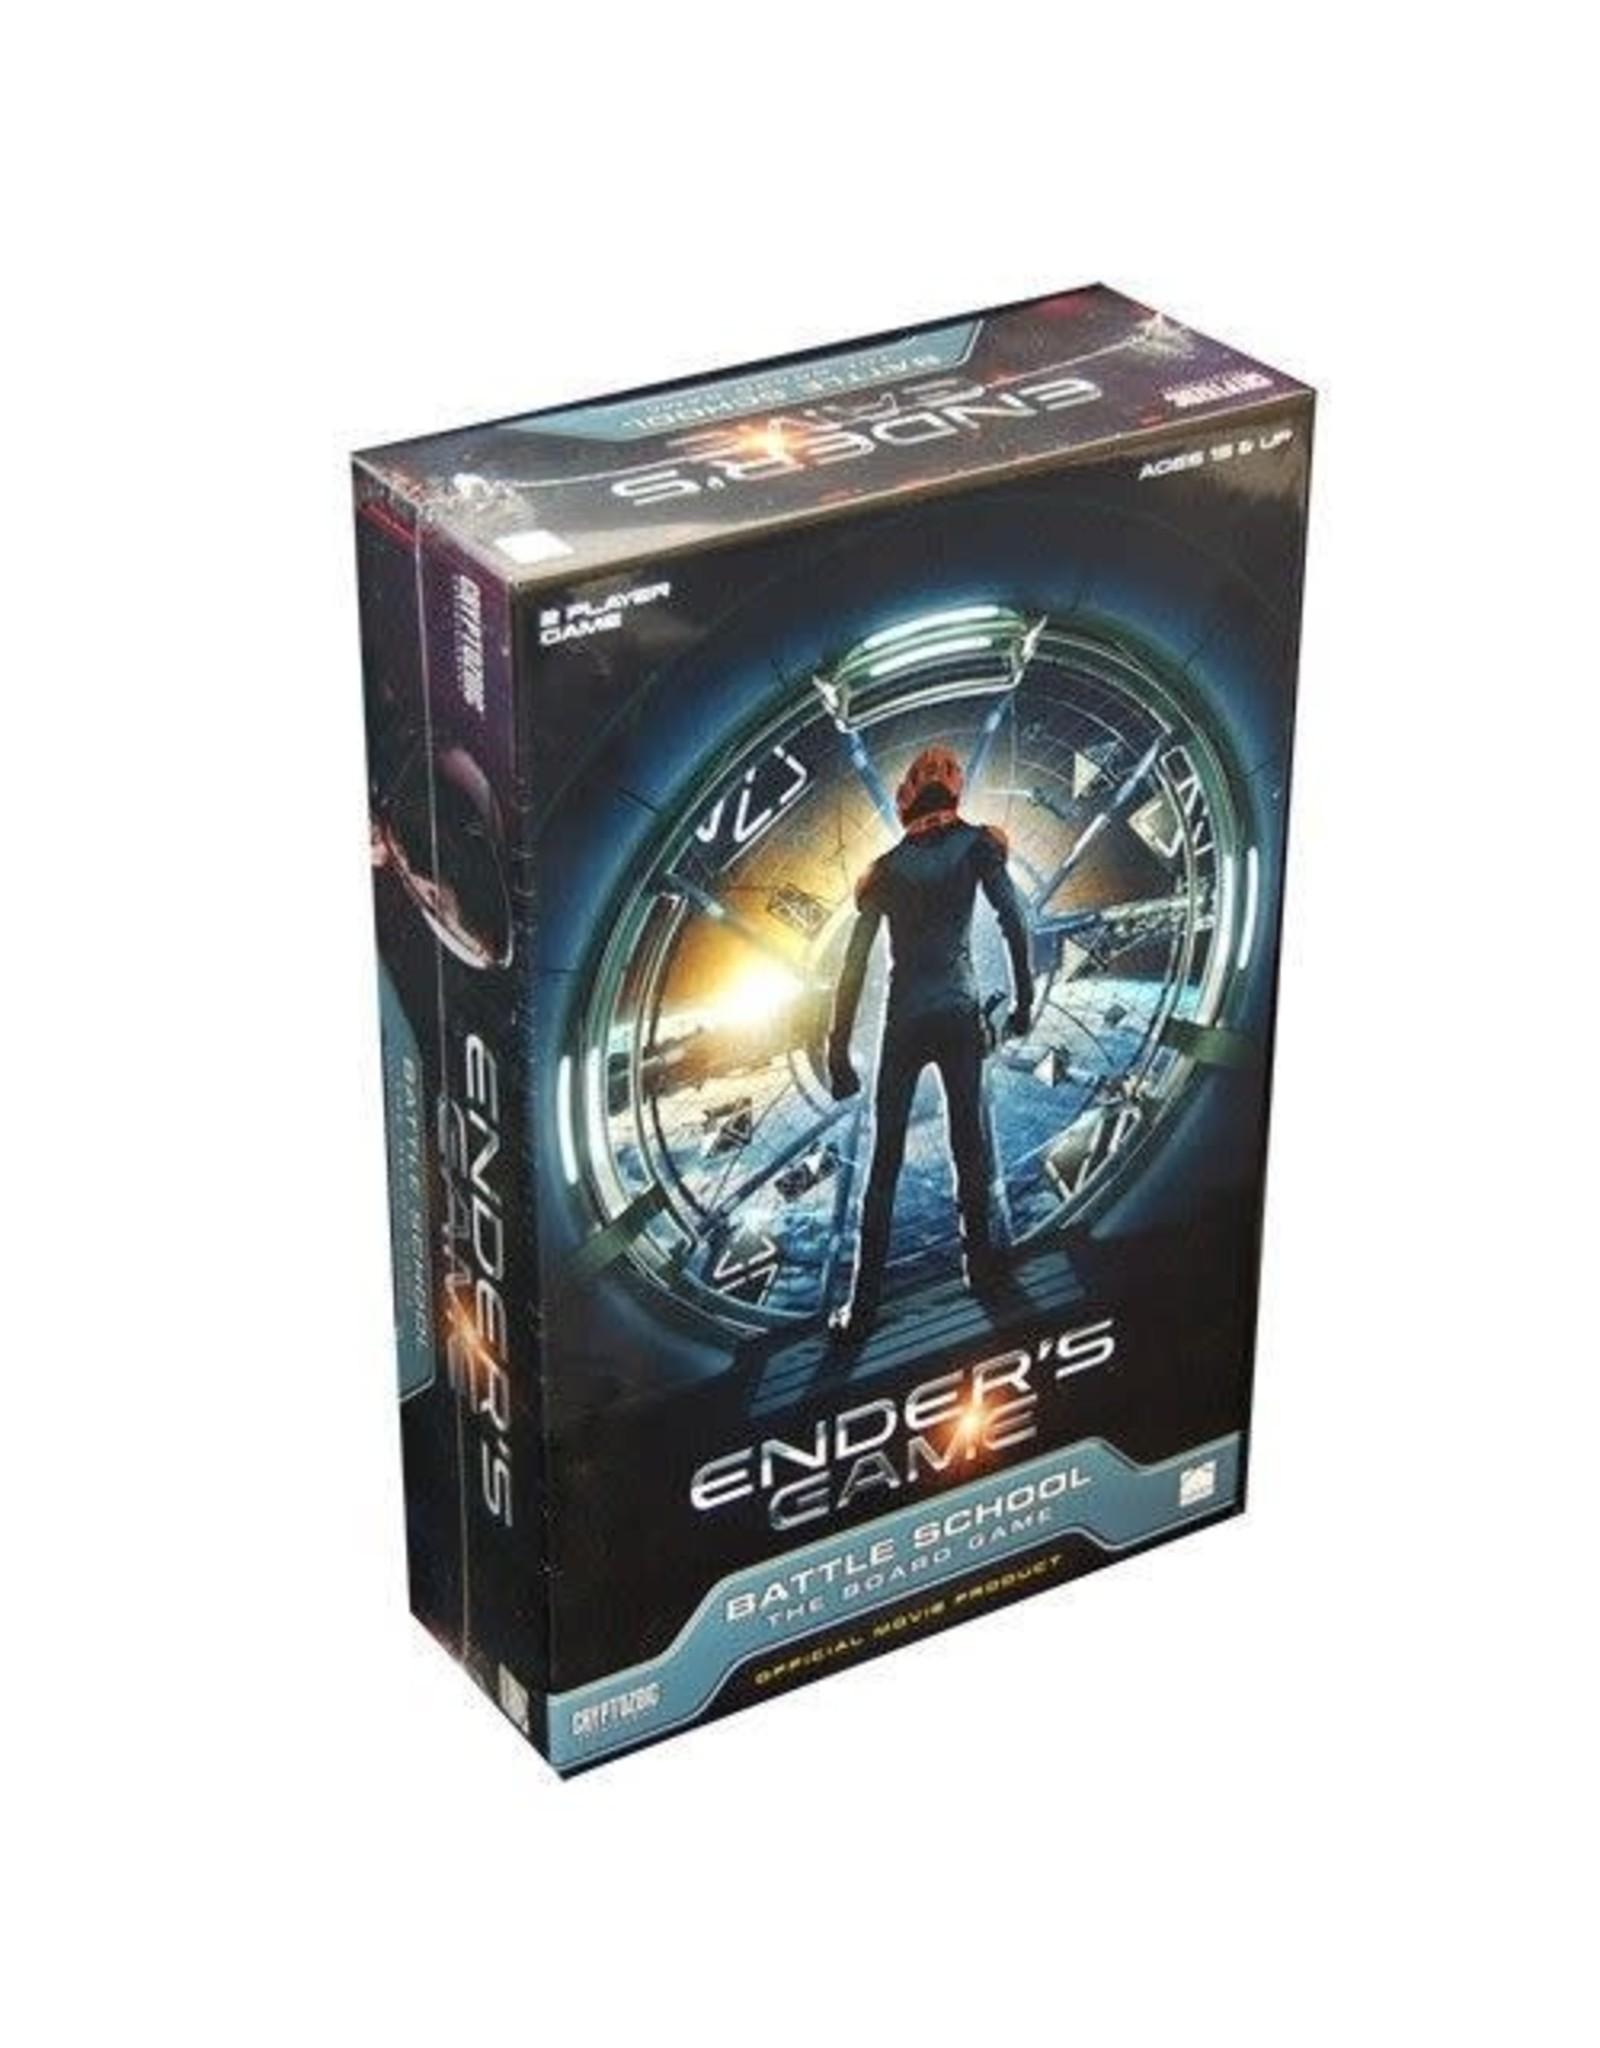 Cryptozoic Ender's Game Battle School